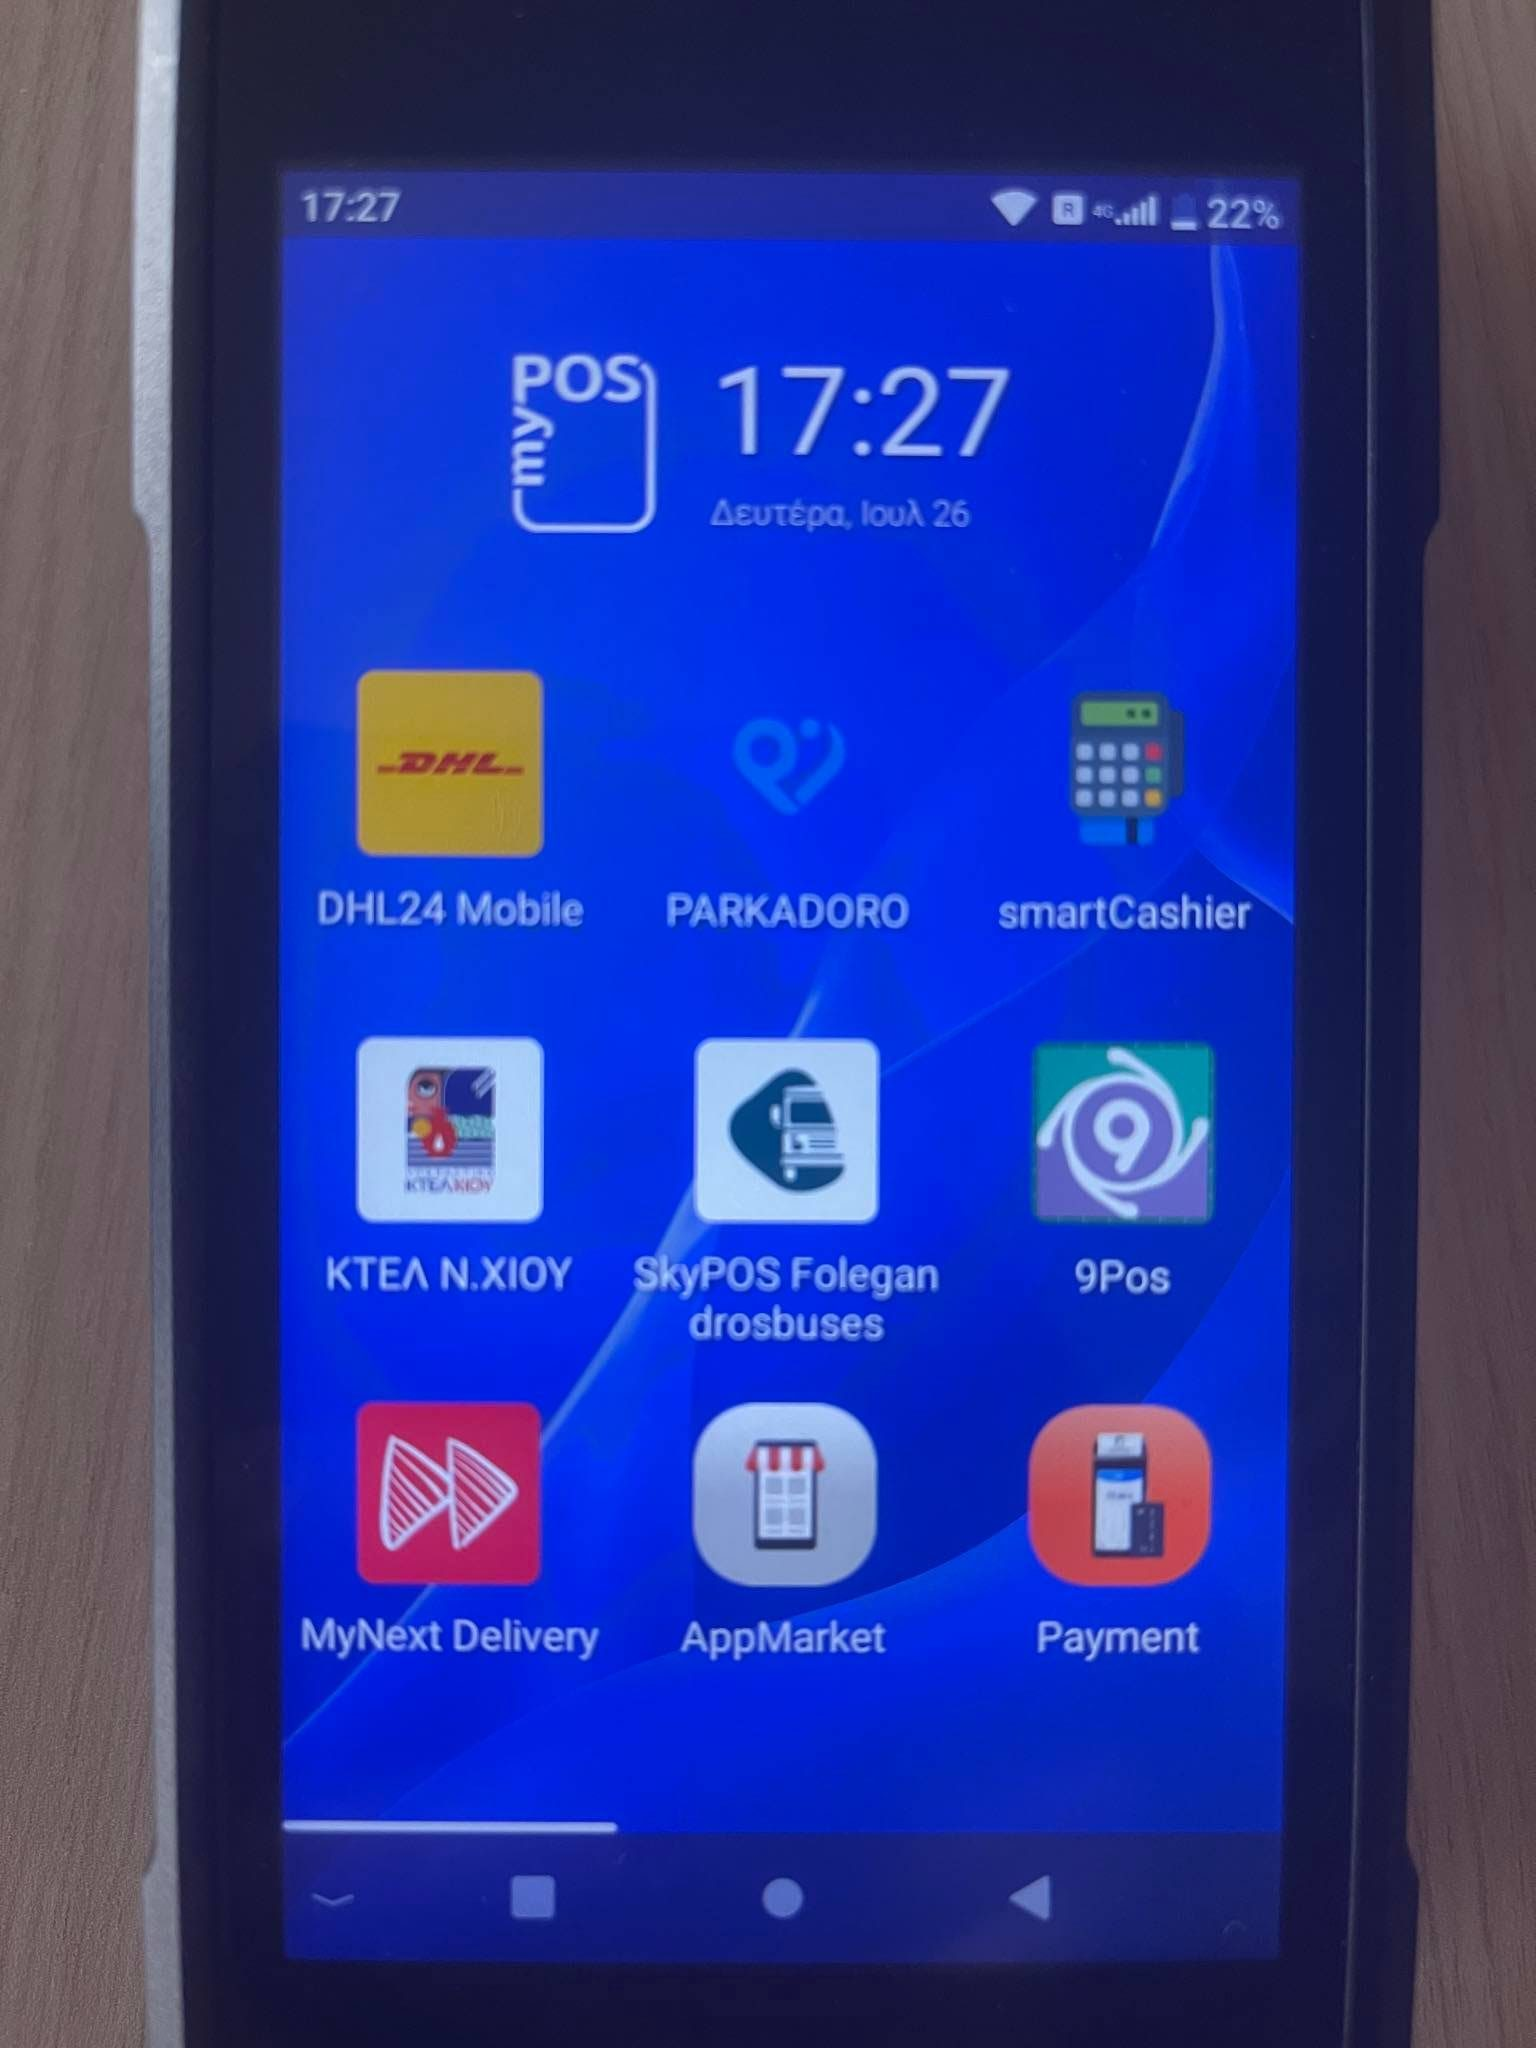 mypos android app market